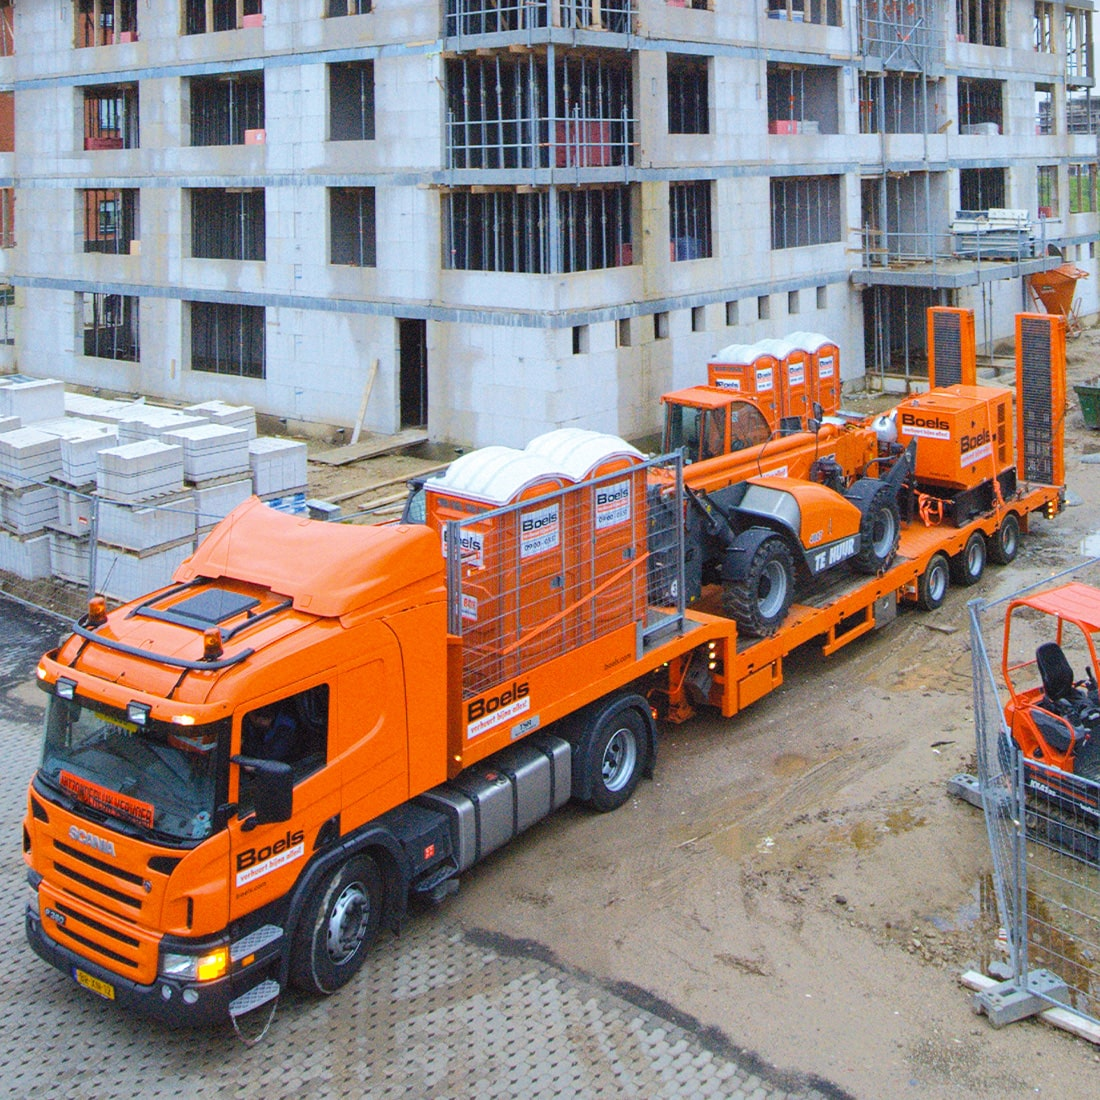 Boels Rental - inspHire Company